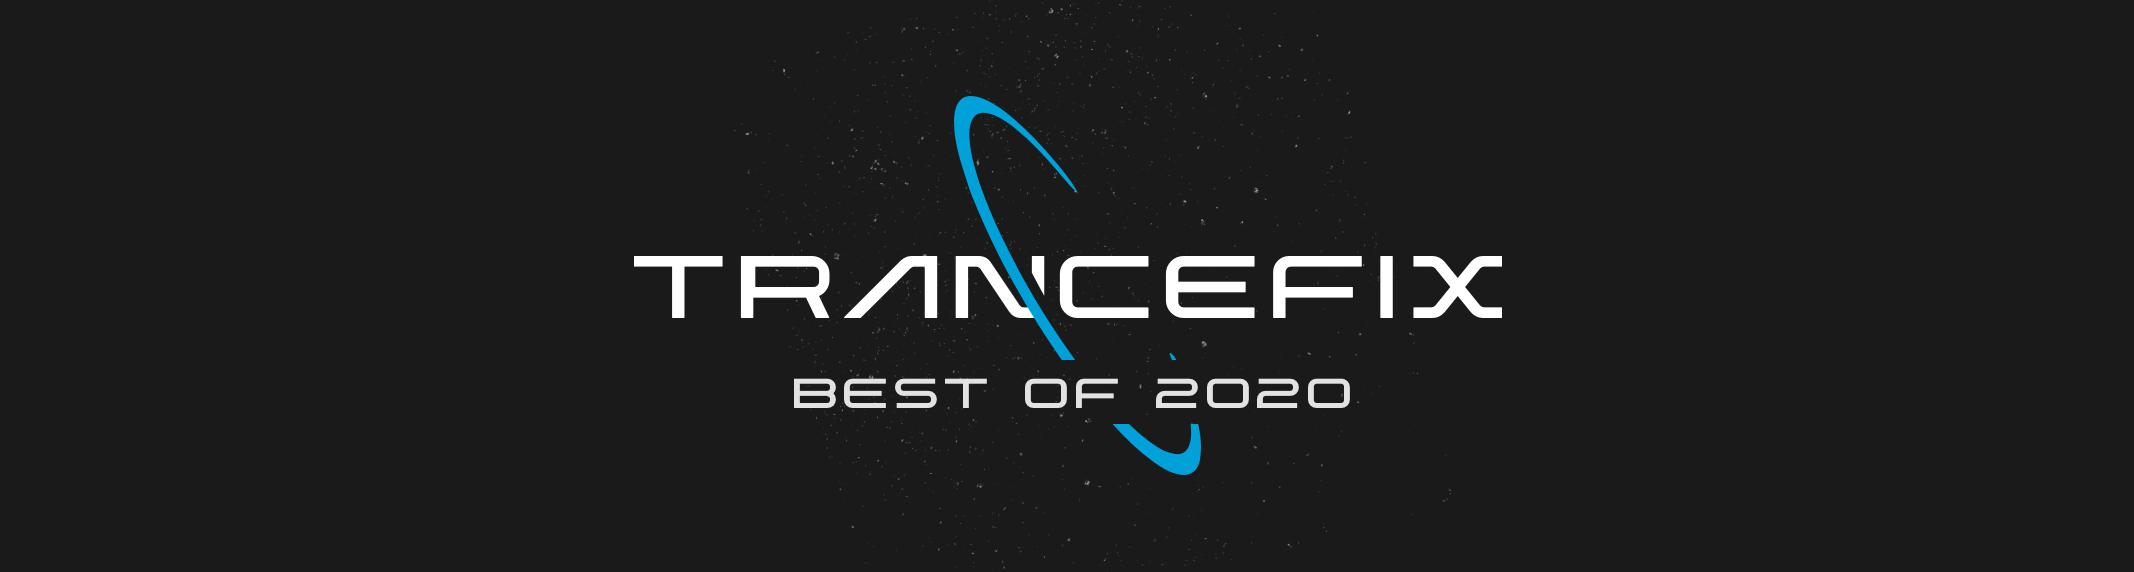 Trancefix 'Best of' 2020.png